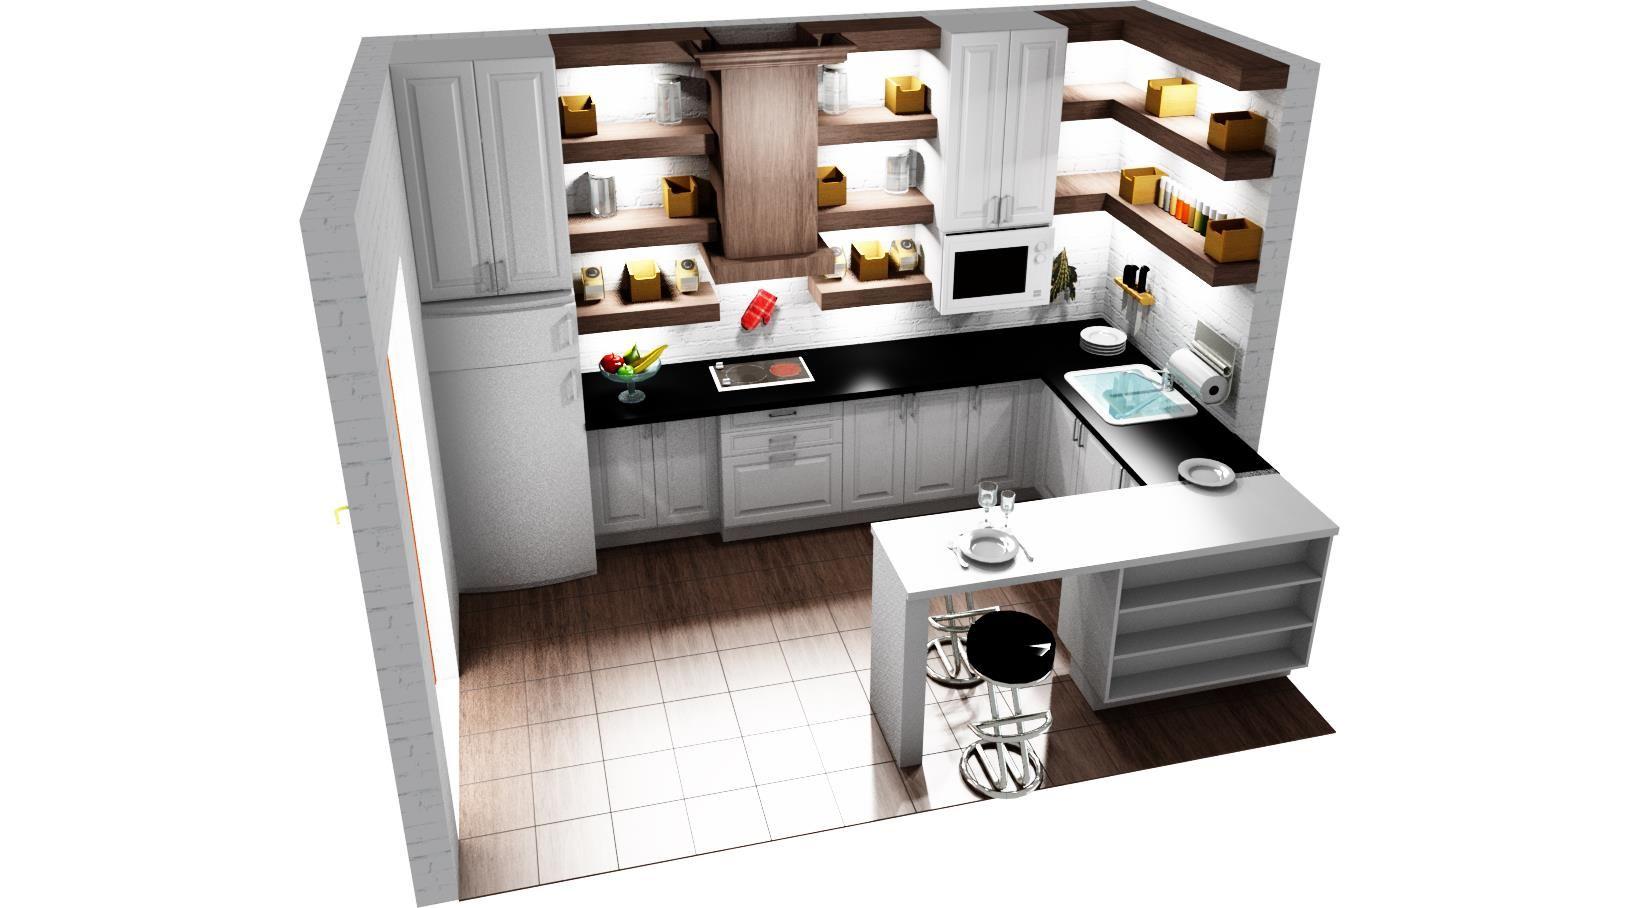 Pin By Mostafa Hussen On 3d Designs 3d Design Design